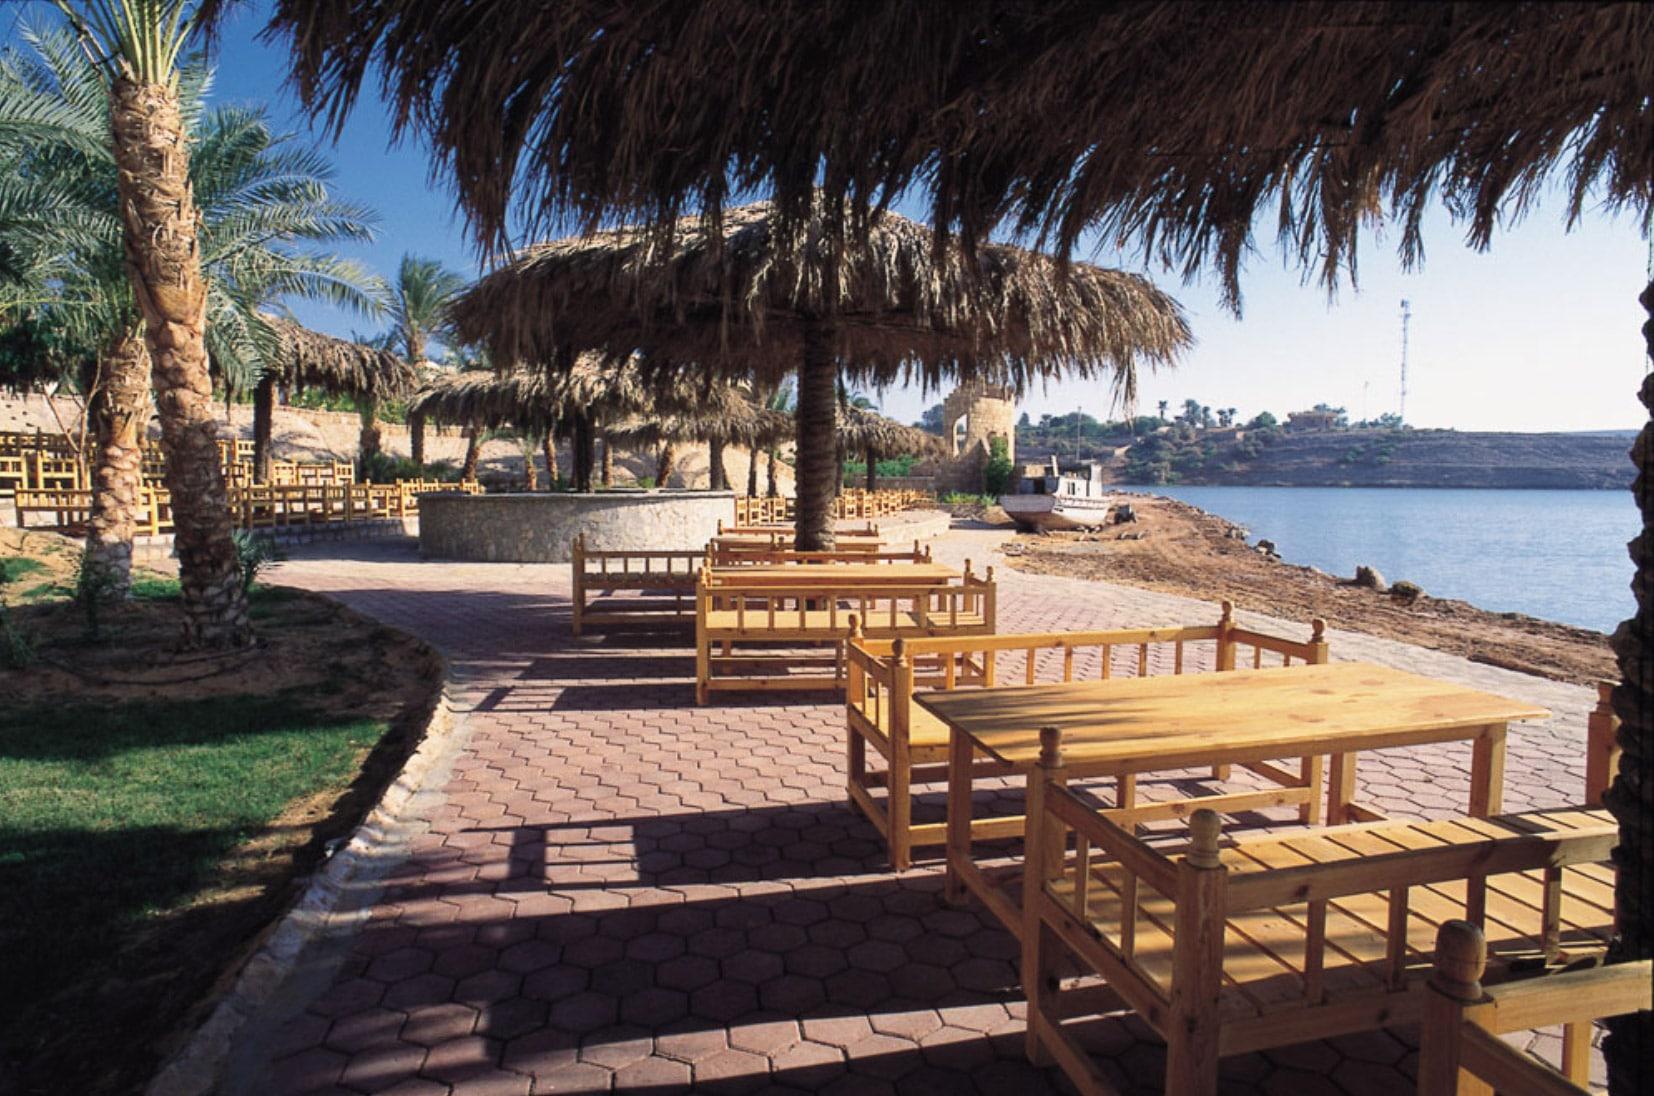 Seti-First-Abu-Simbel-Aegypten